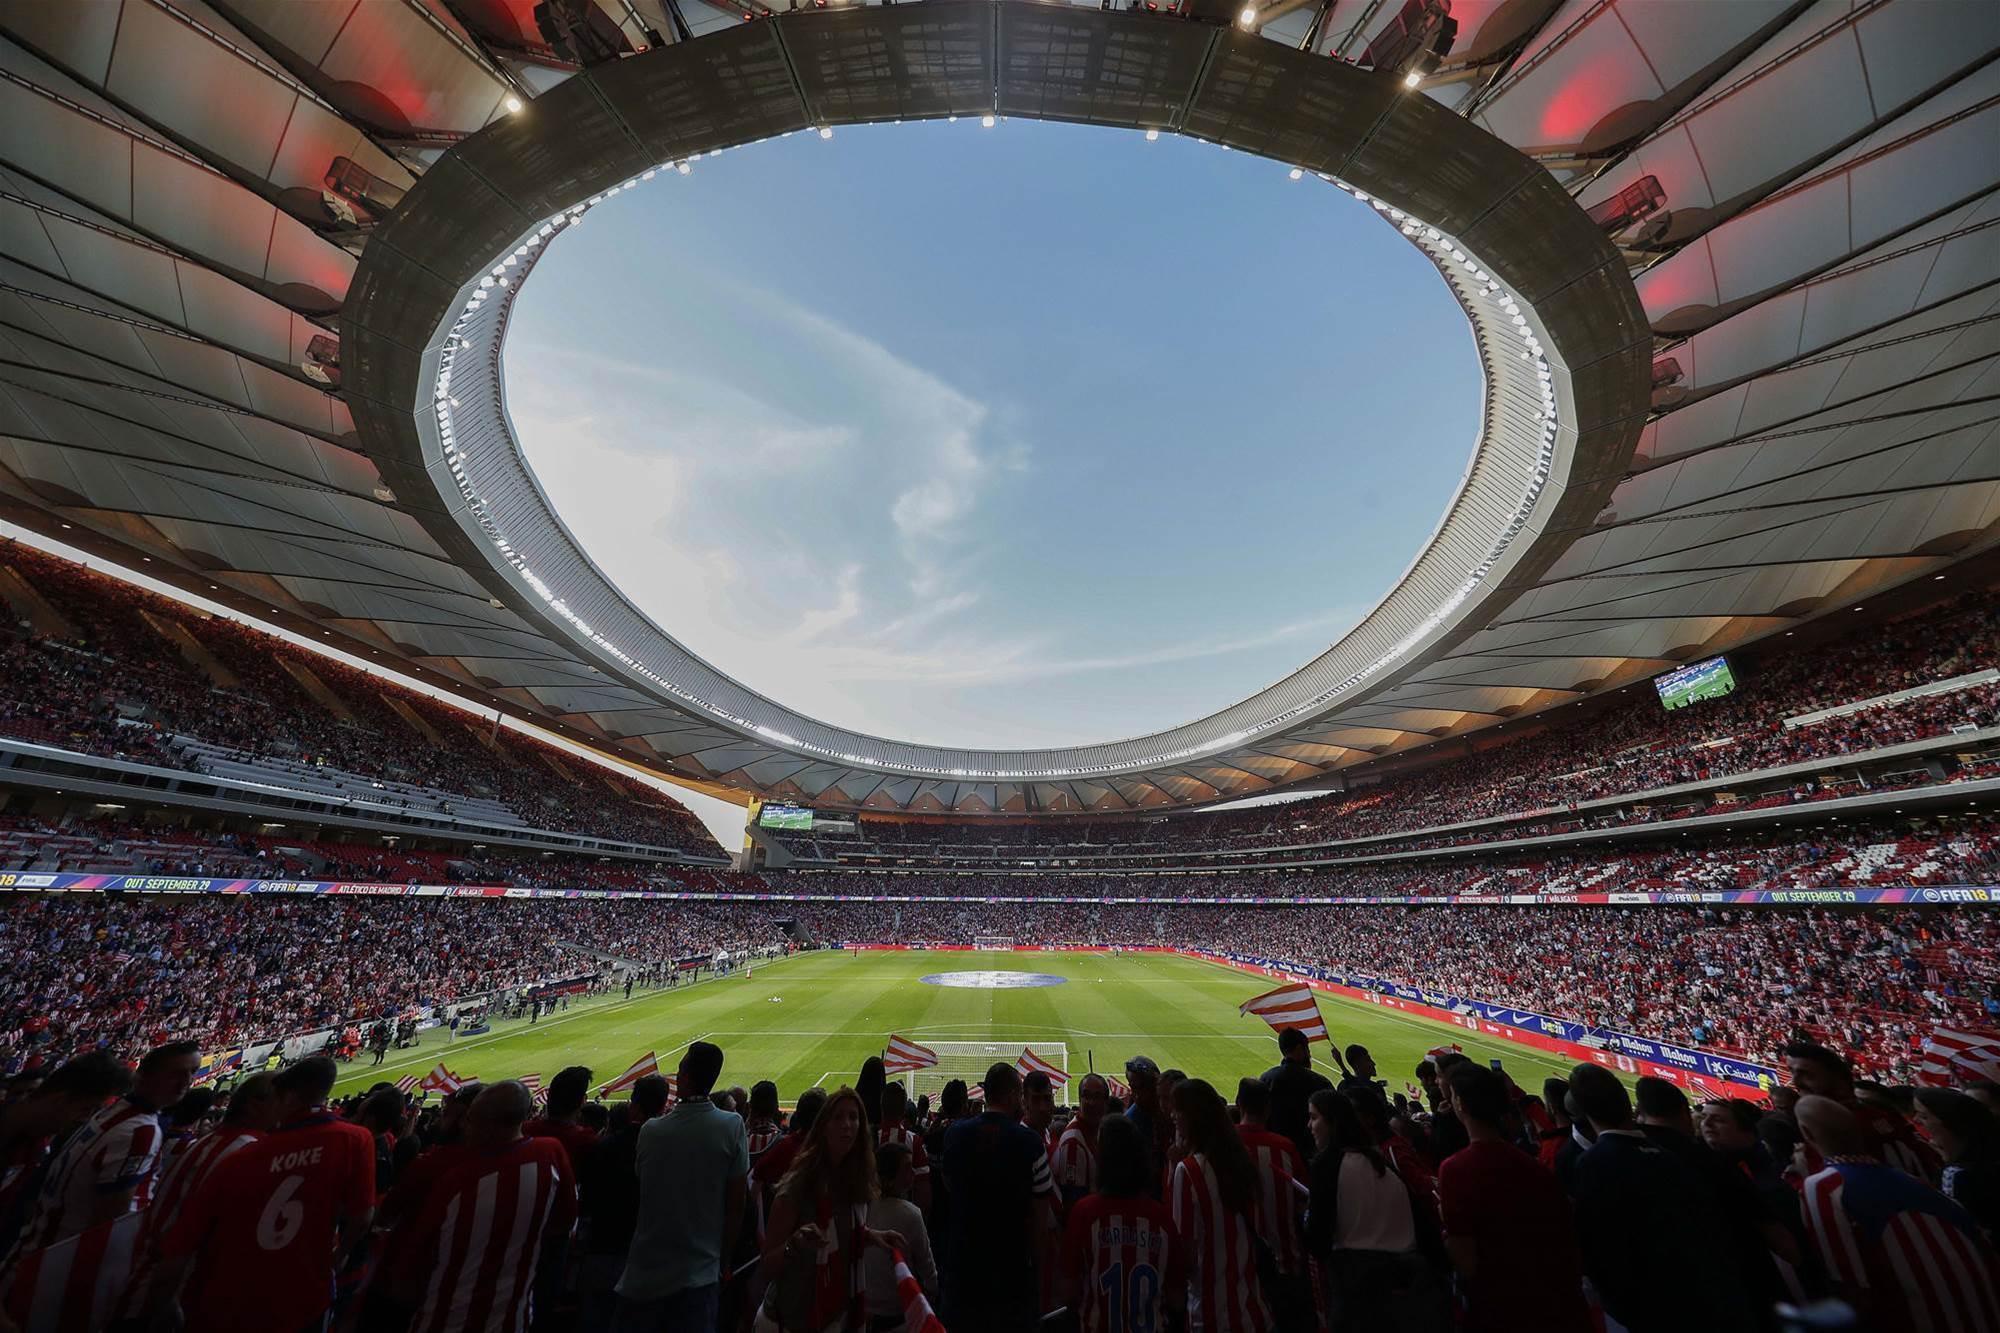 The Wanda Metropolitano: A stadium for the future